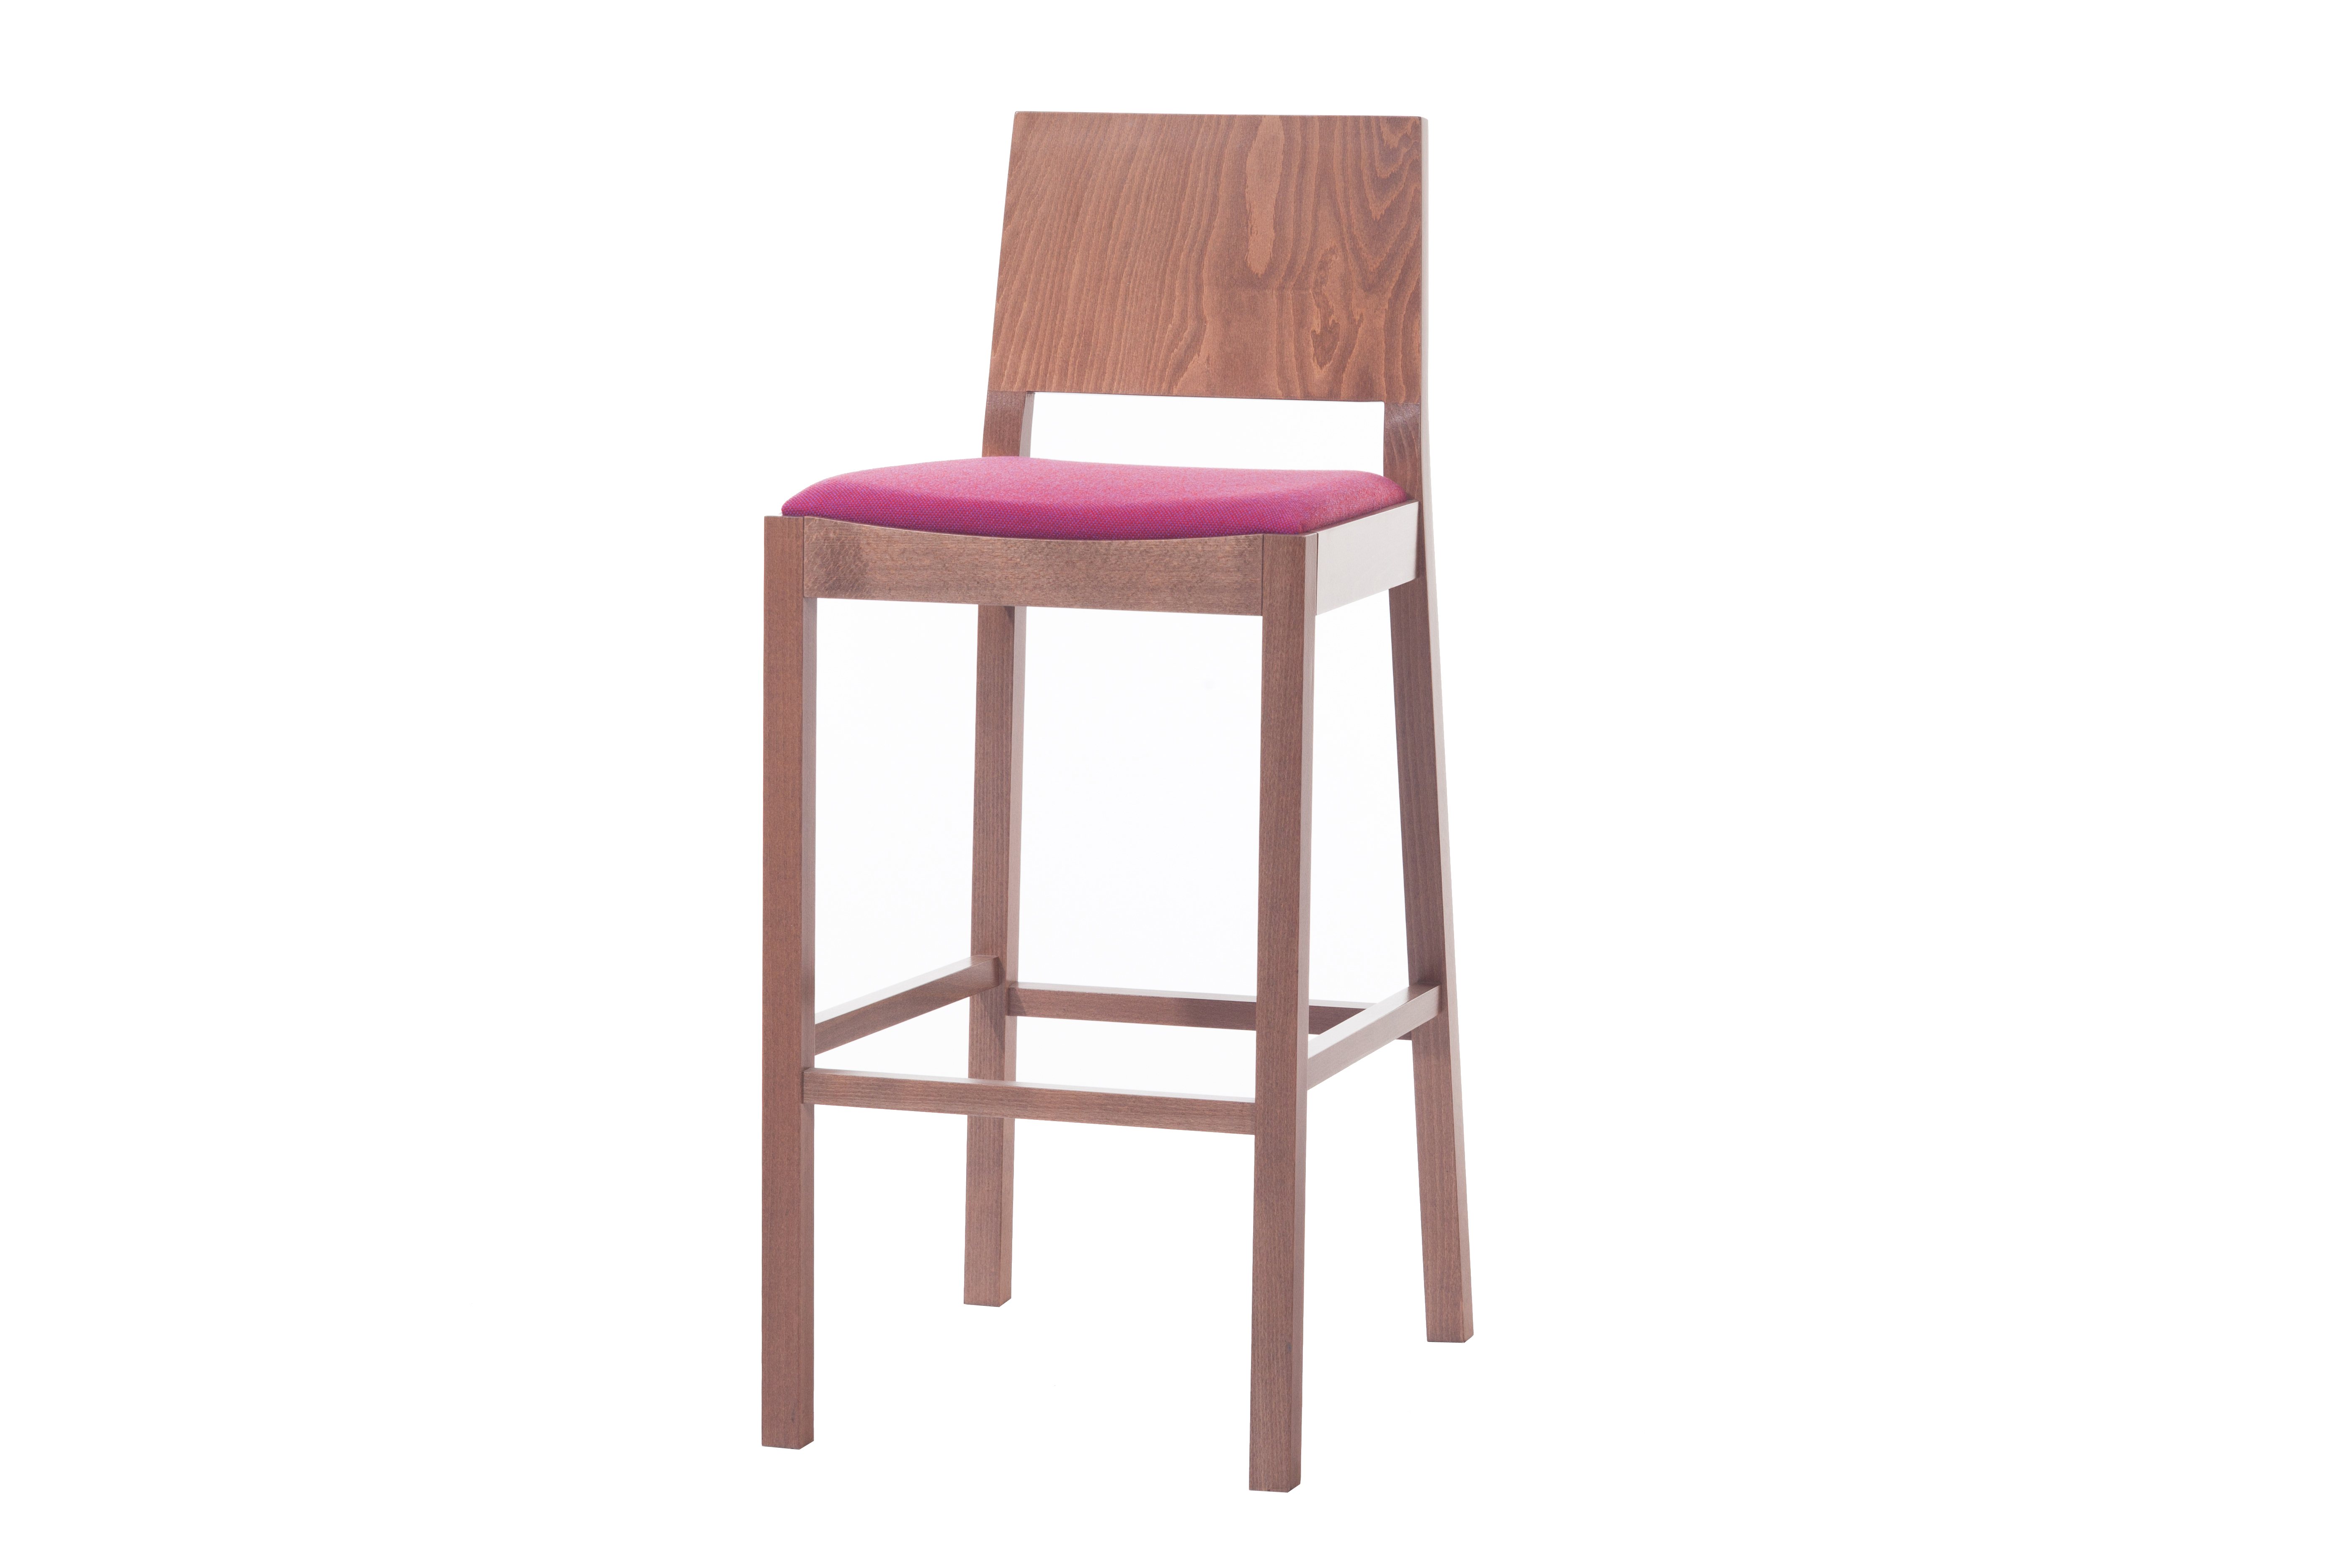 Scaun de bar din lemn de fag, tapitat cu stofa Lyon Walnut / Pink 515, l44xA53xH102 cm